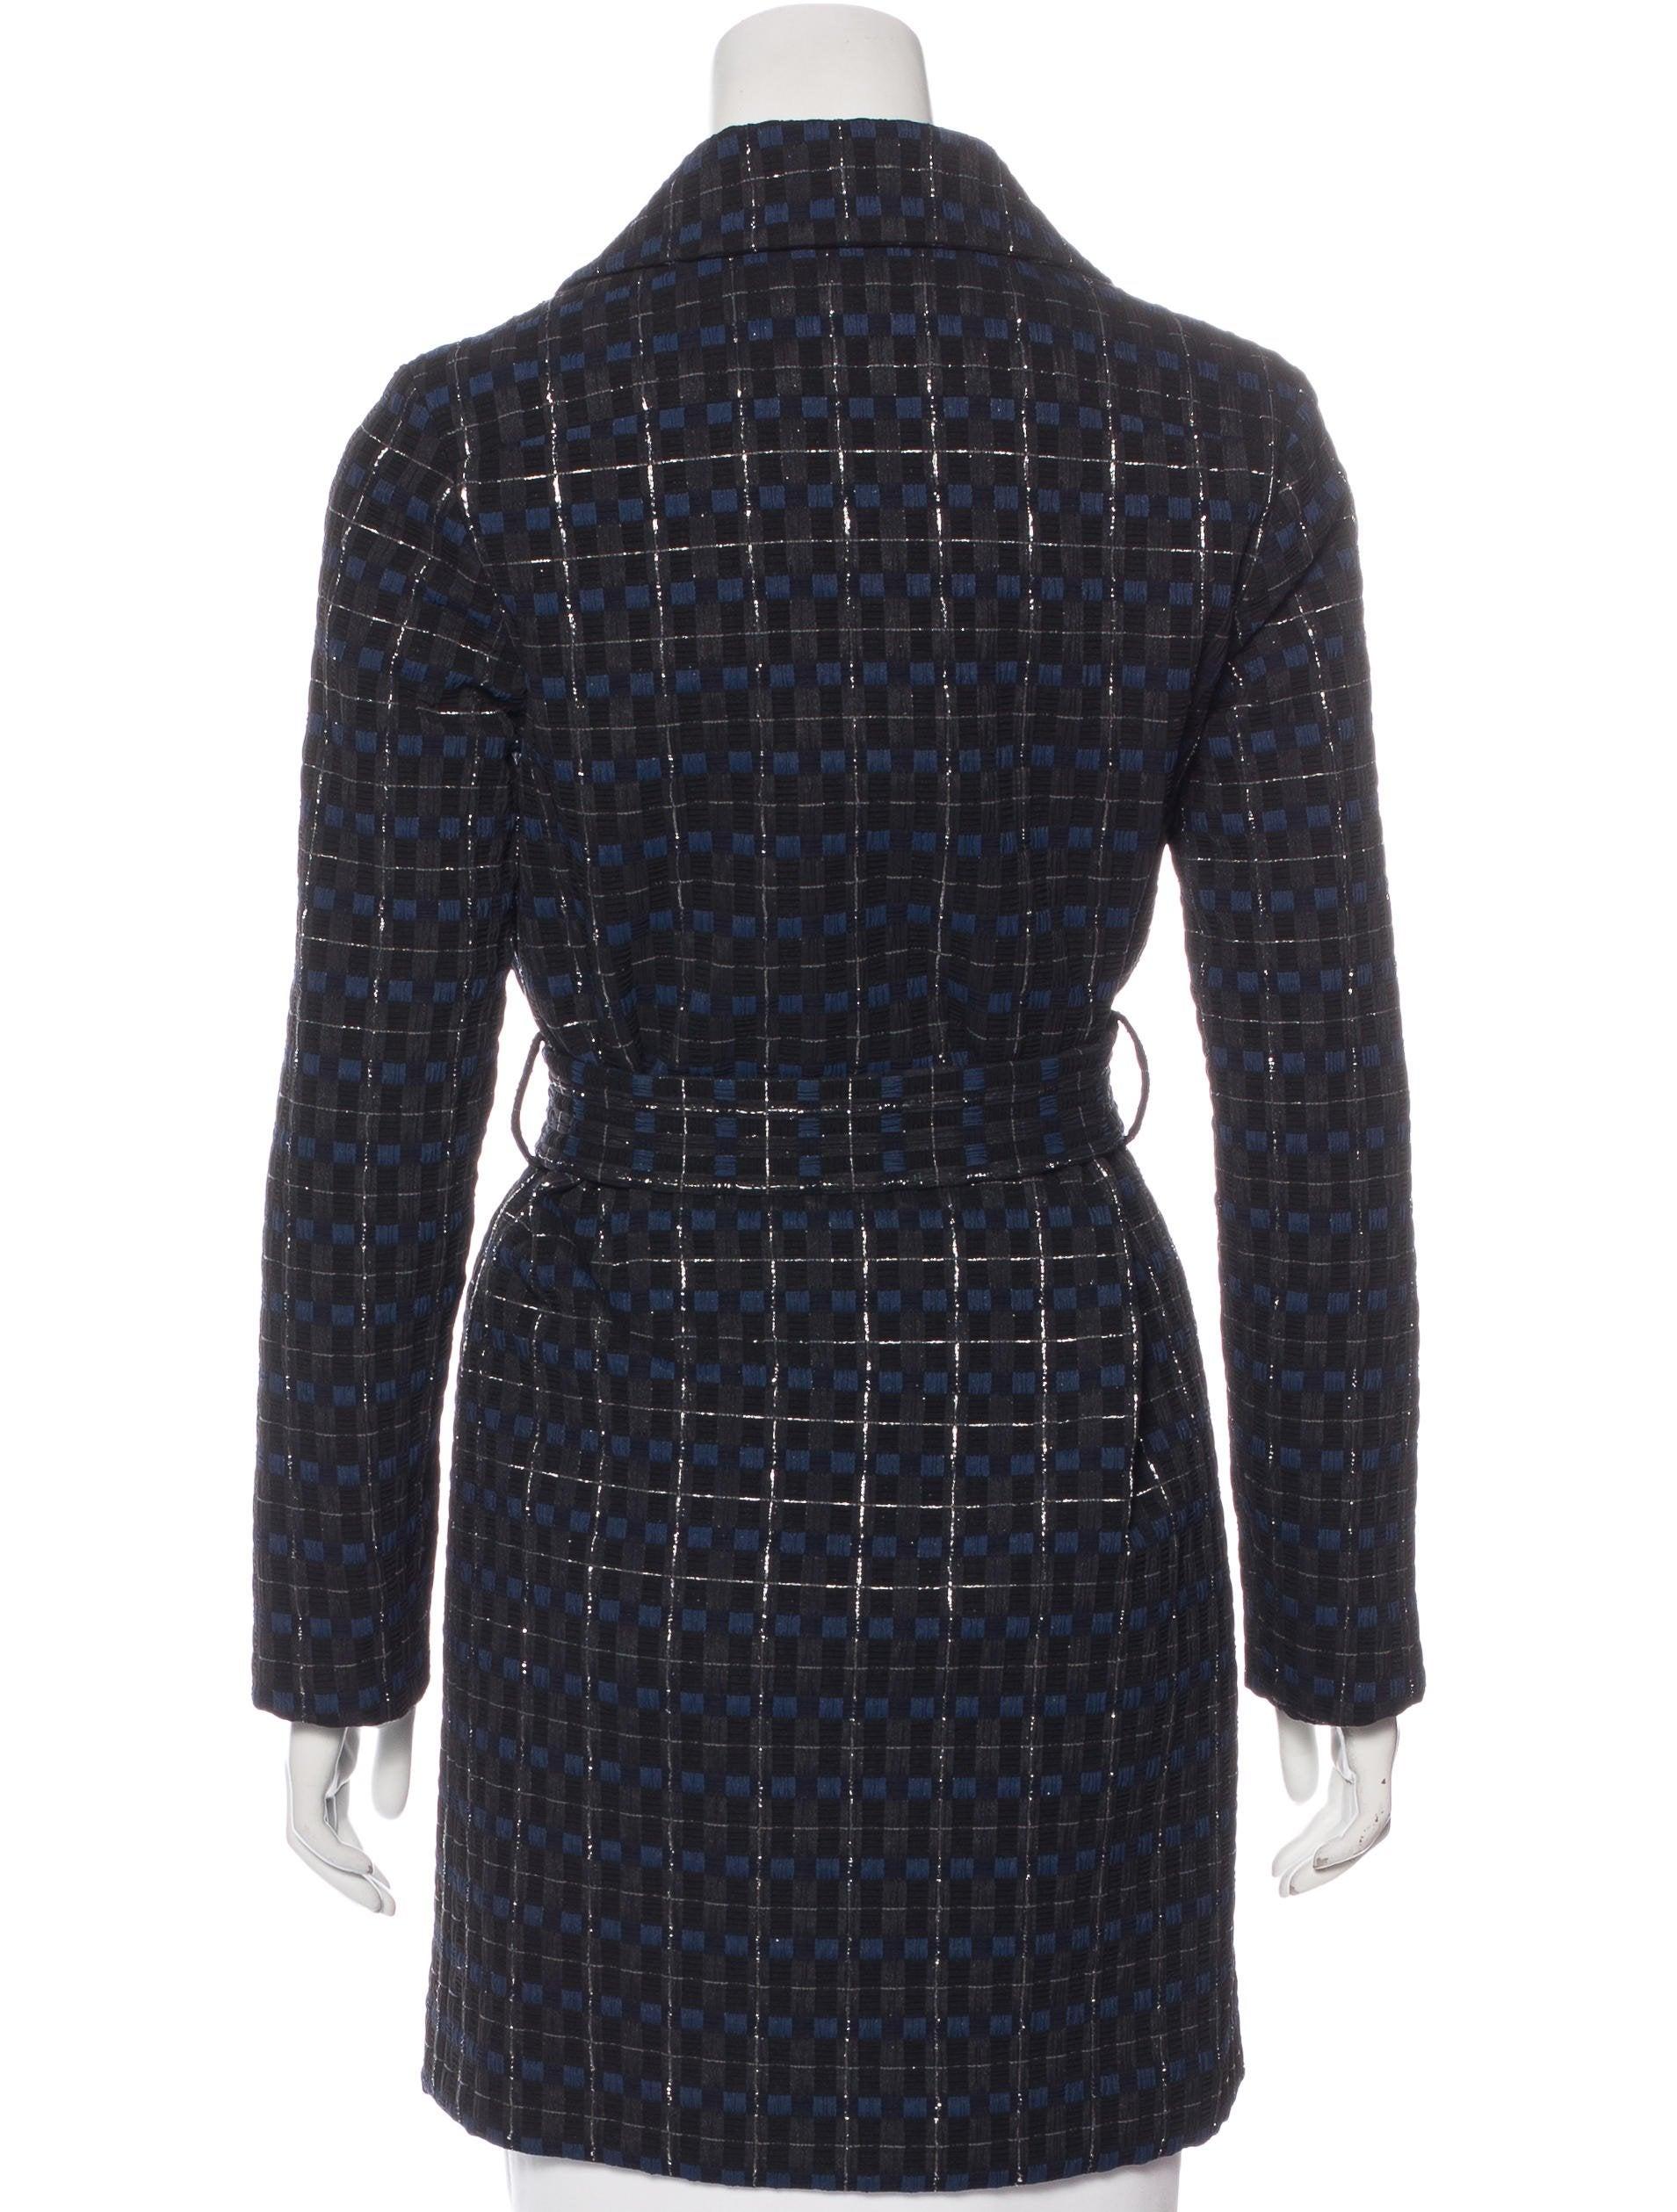 13fb8e5c3ee7 Chanel 2016 Paris-Rome Metallic Coat w  Tags - Clothing - CHA169851 ...